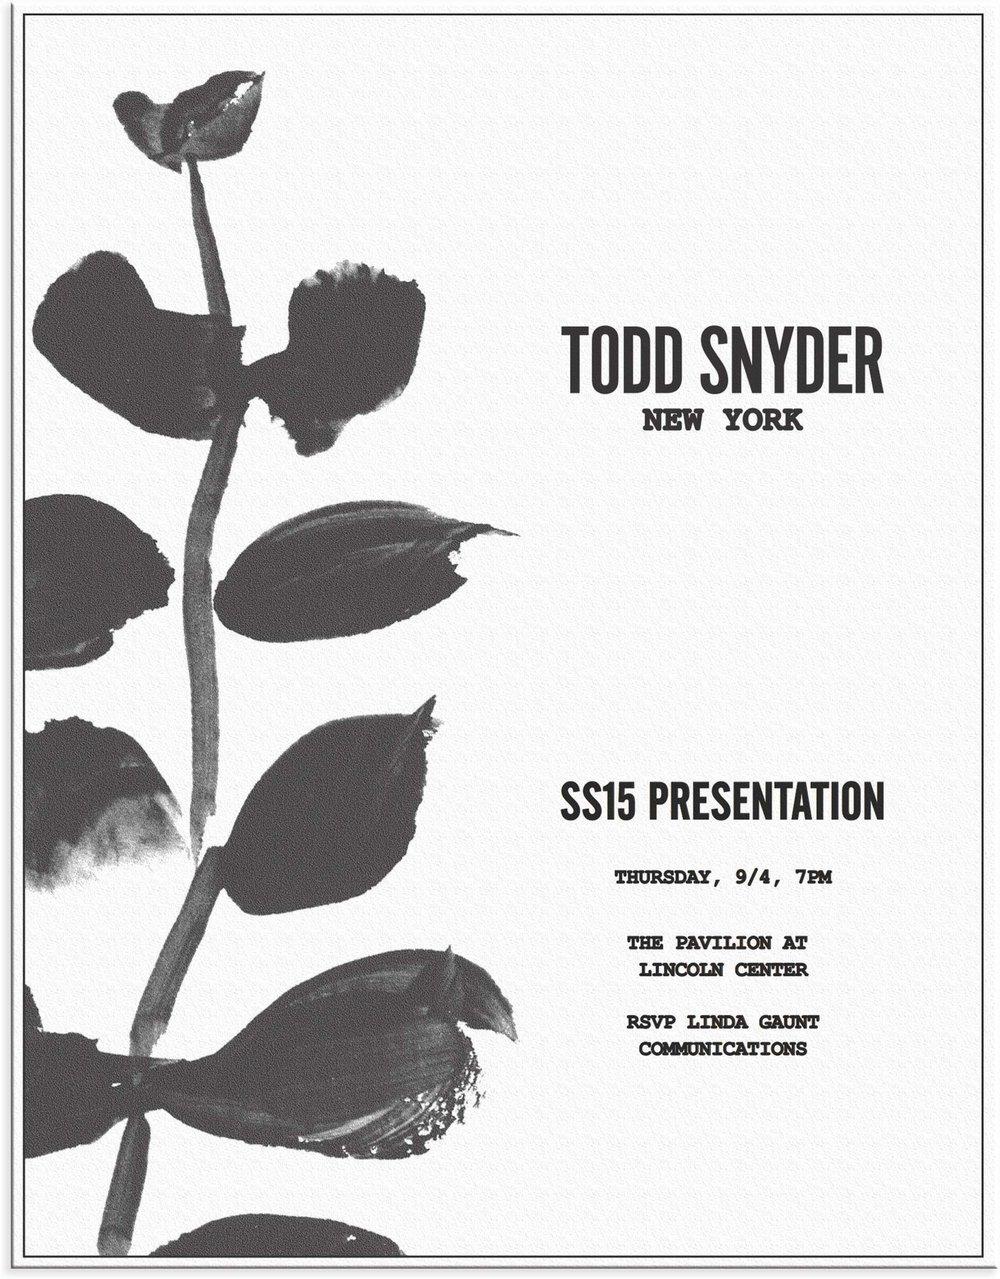 ss15-invite-todd-snyder copy.jpg